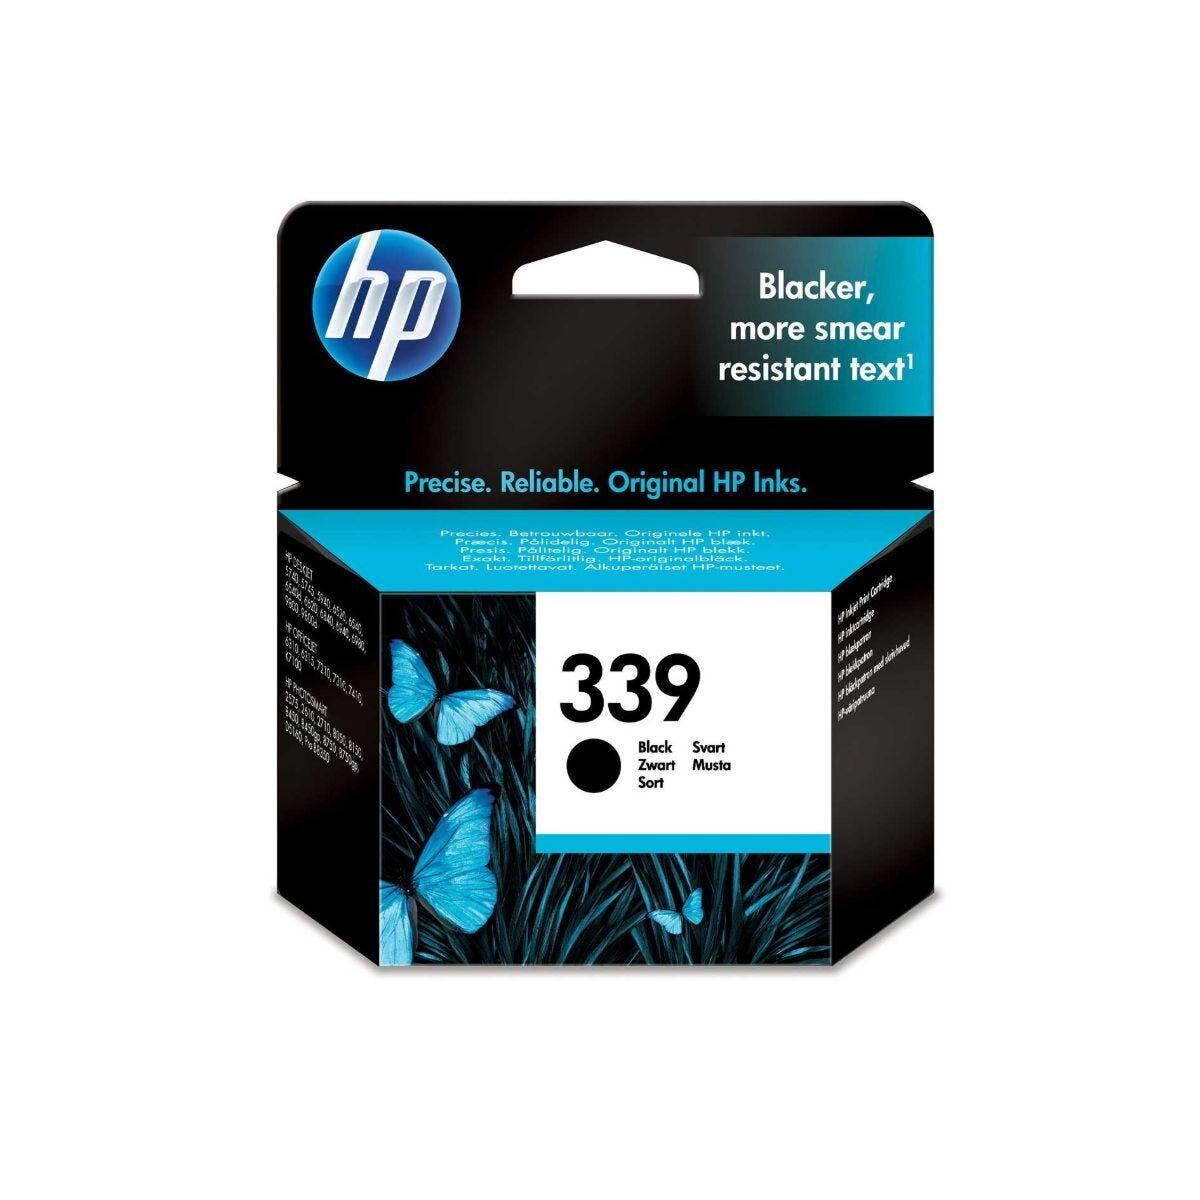 HP 339 Ink Cartridge 21ml